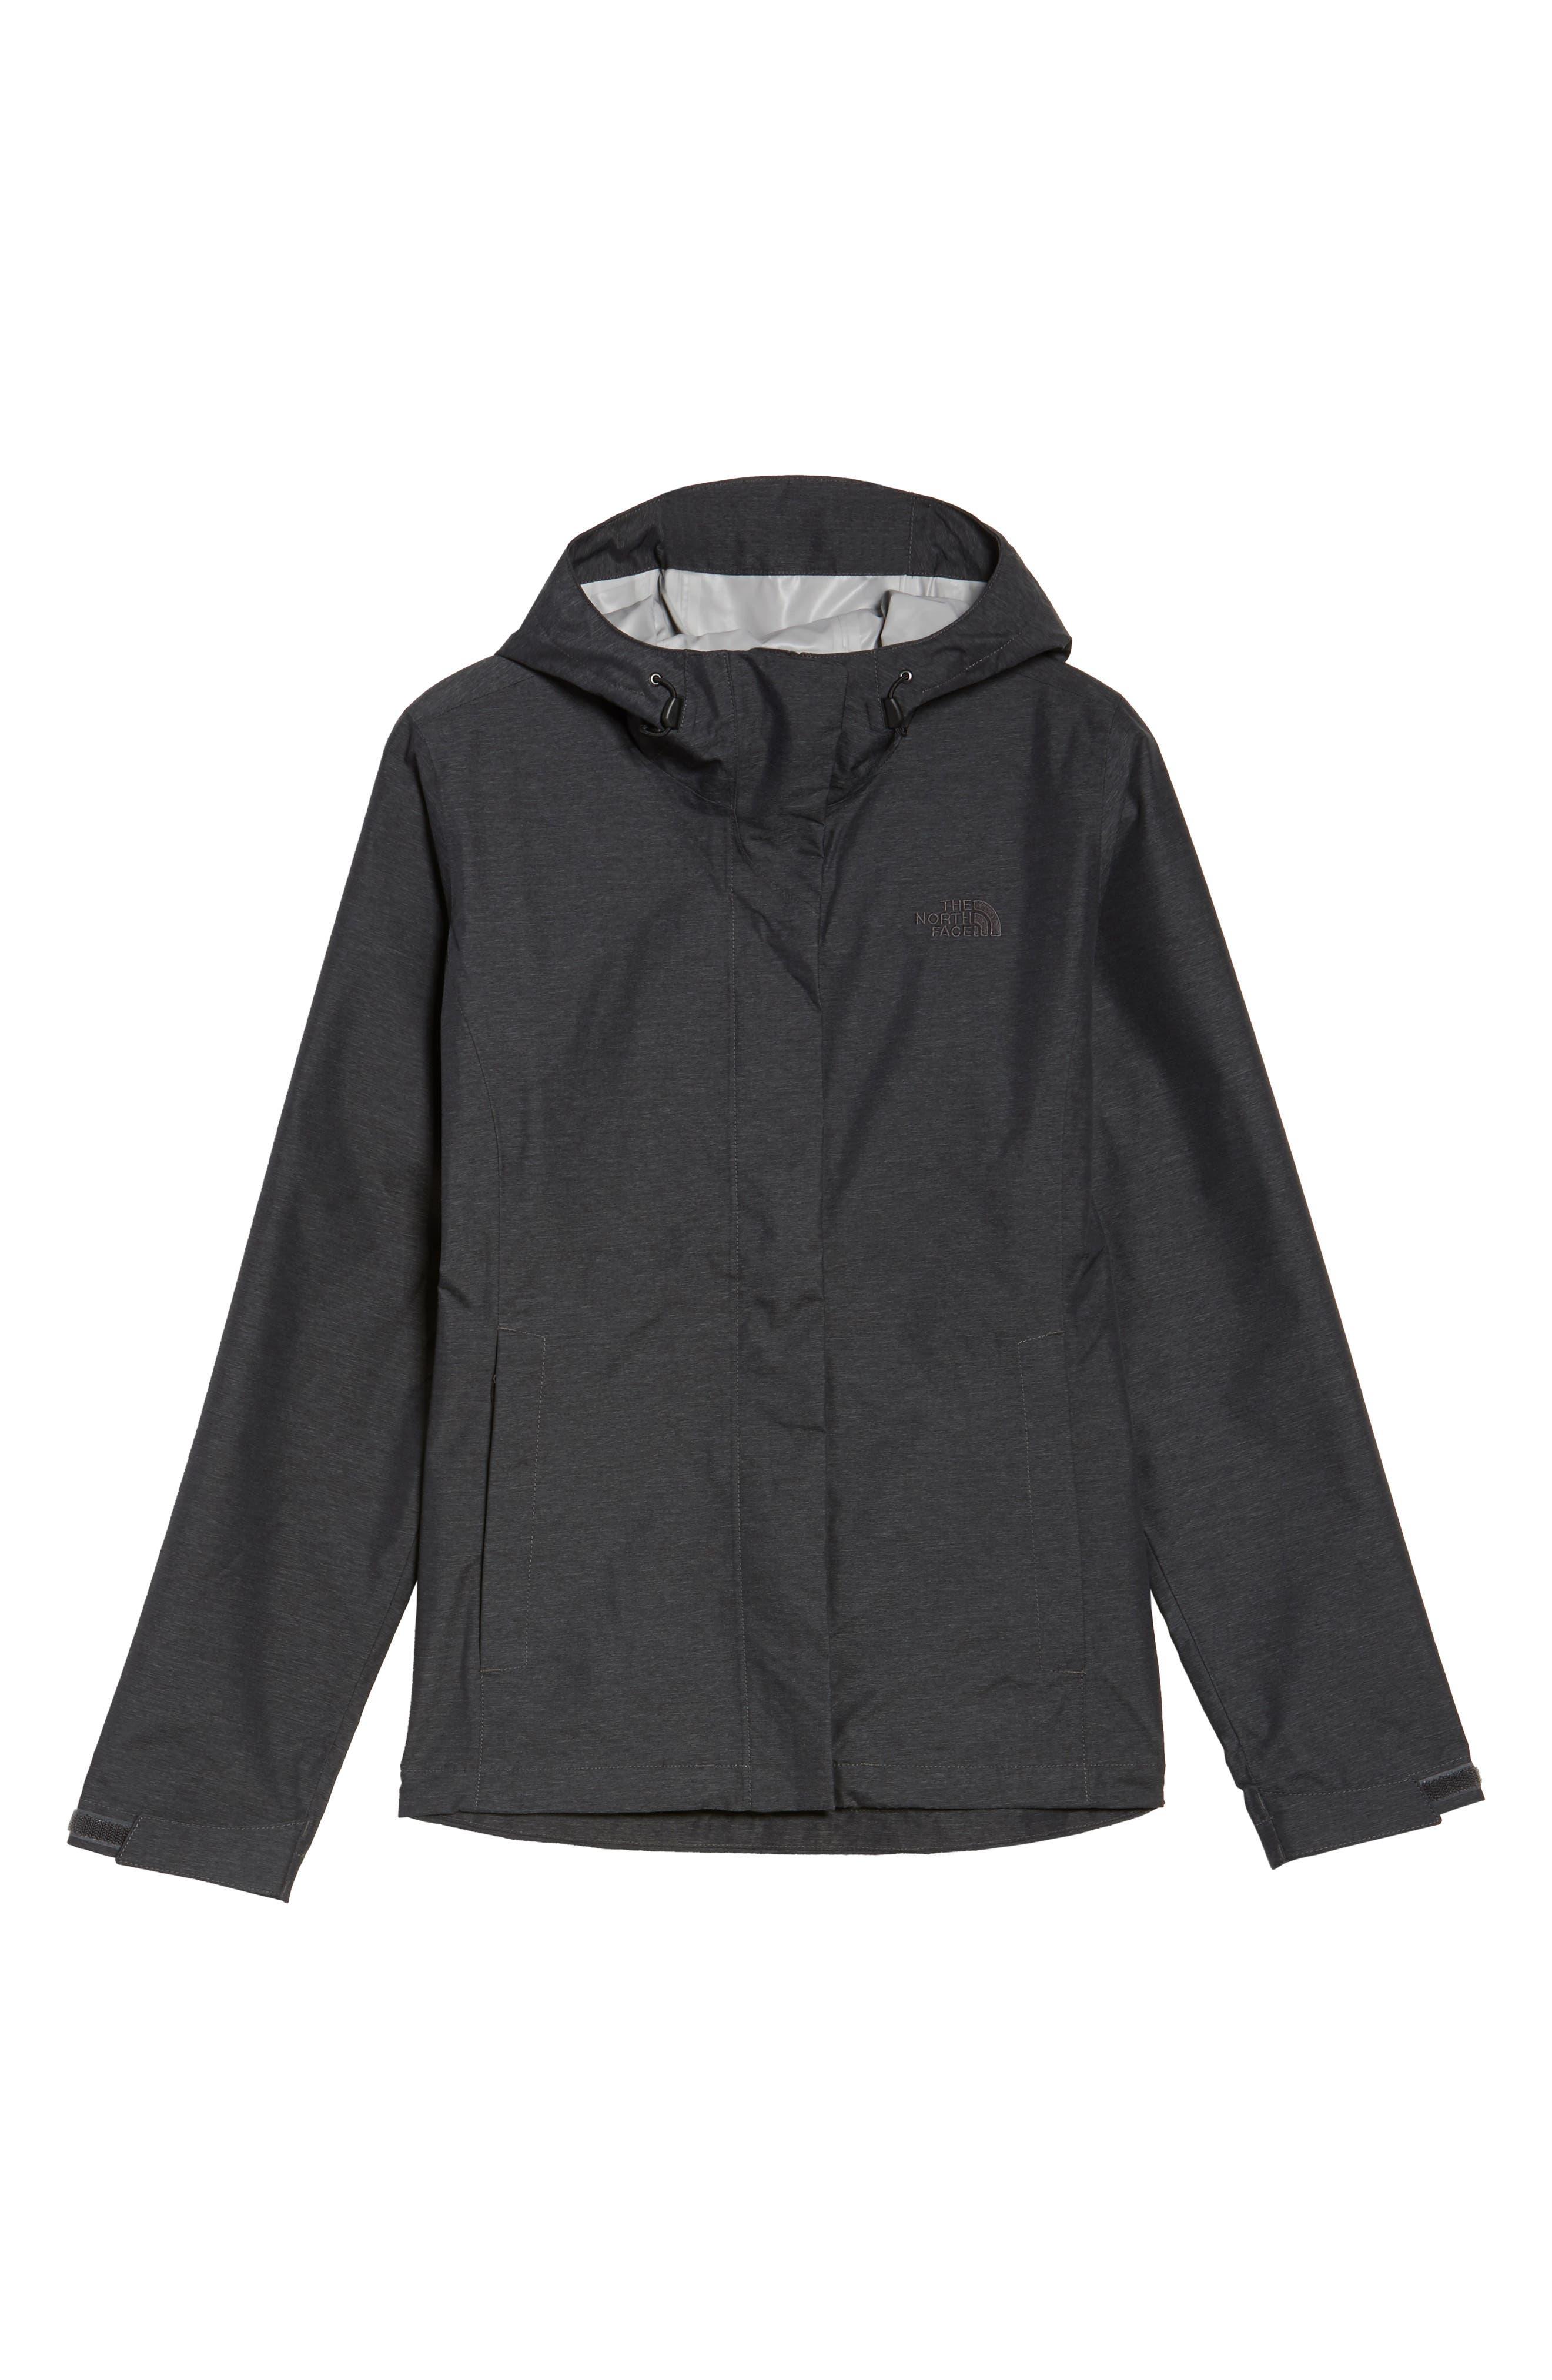 Venture 2 Waterproof Jacket,                             Alternate thumbnail 6, color,                             TNF DARK GREY HEATHER